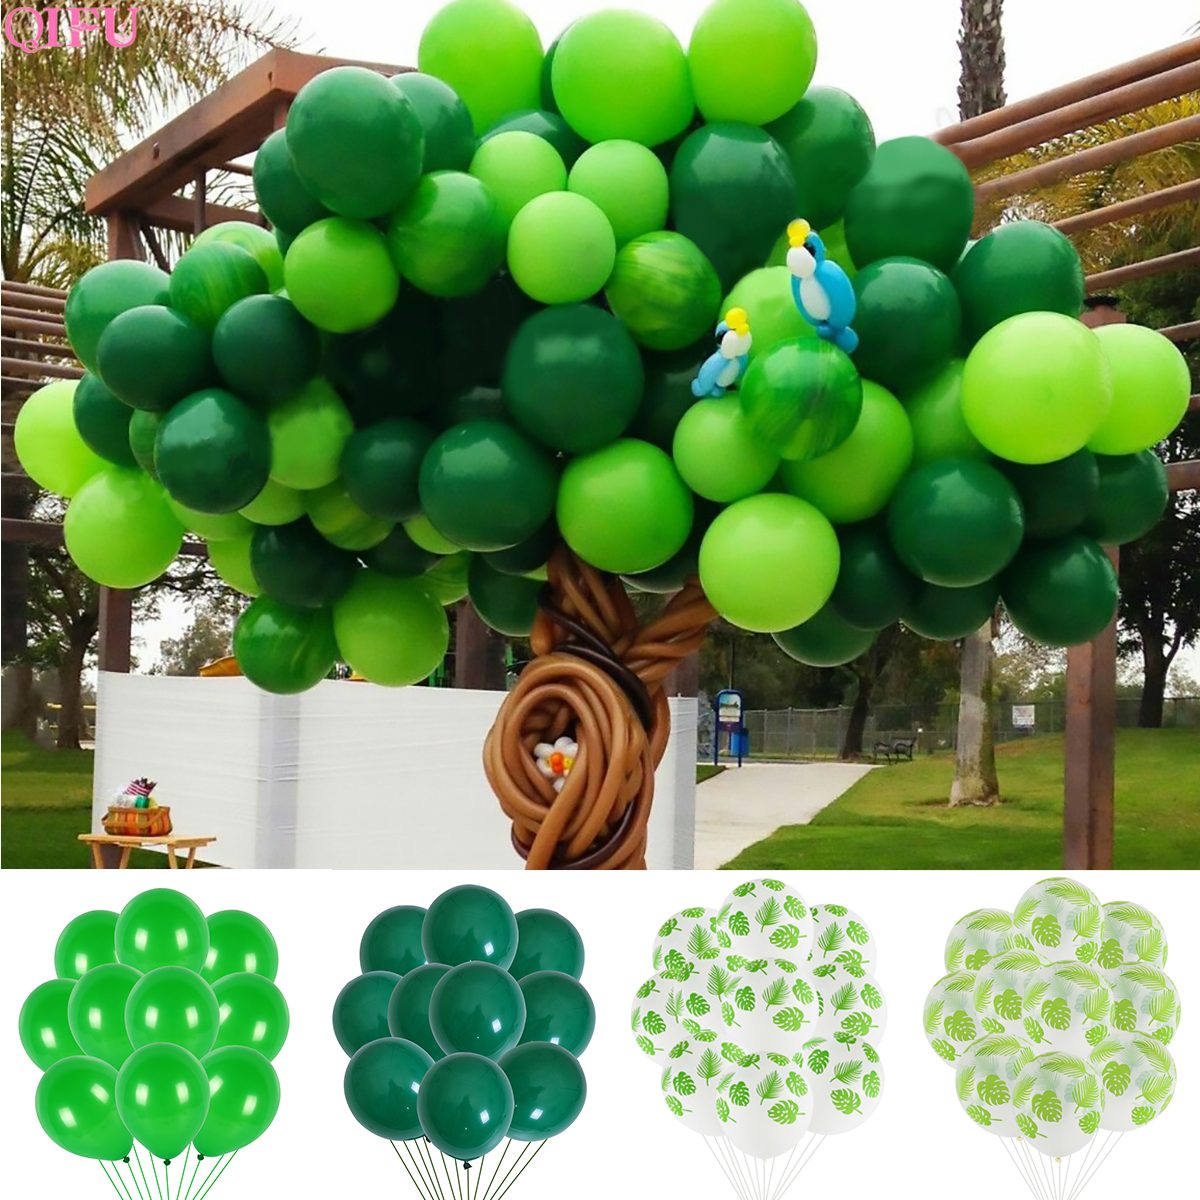 Купить с кэшбэком Baloon Latex balloon Animal Jungle Balloon Birthday balloons Jungle Theme Party Inflatable Ballons Decor Birthday Safari Party